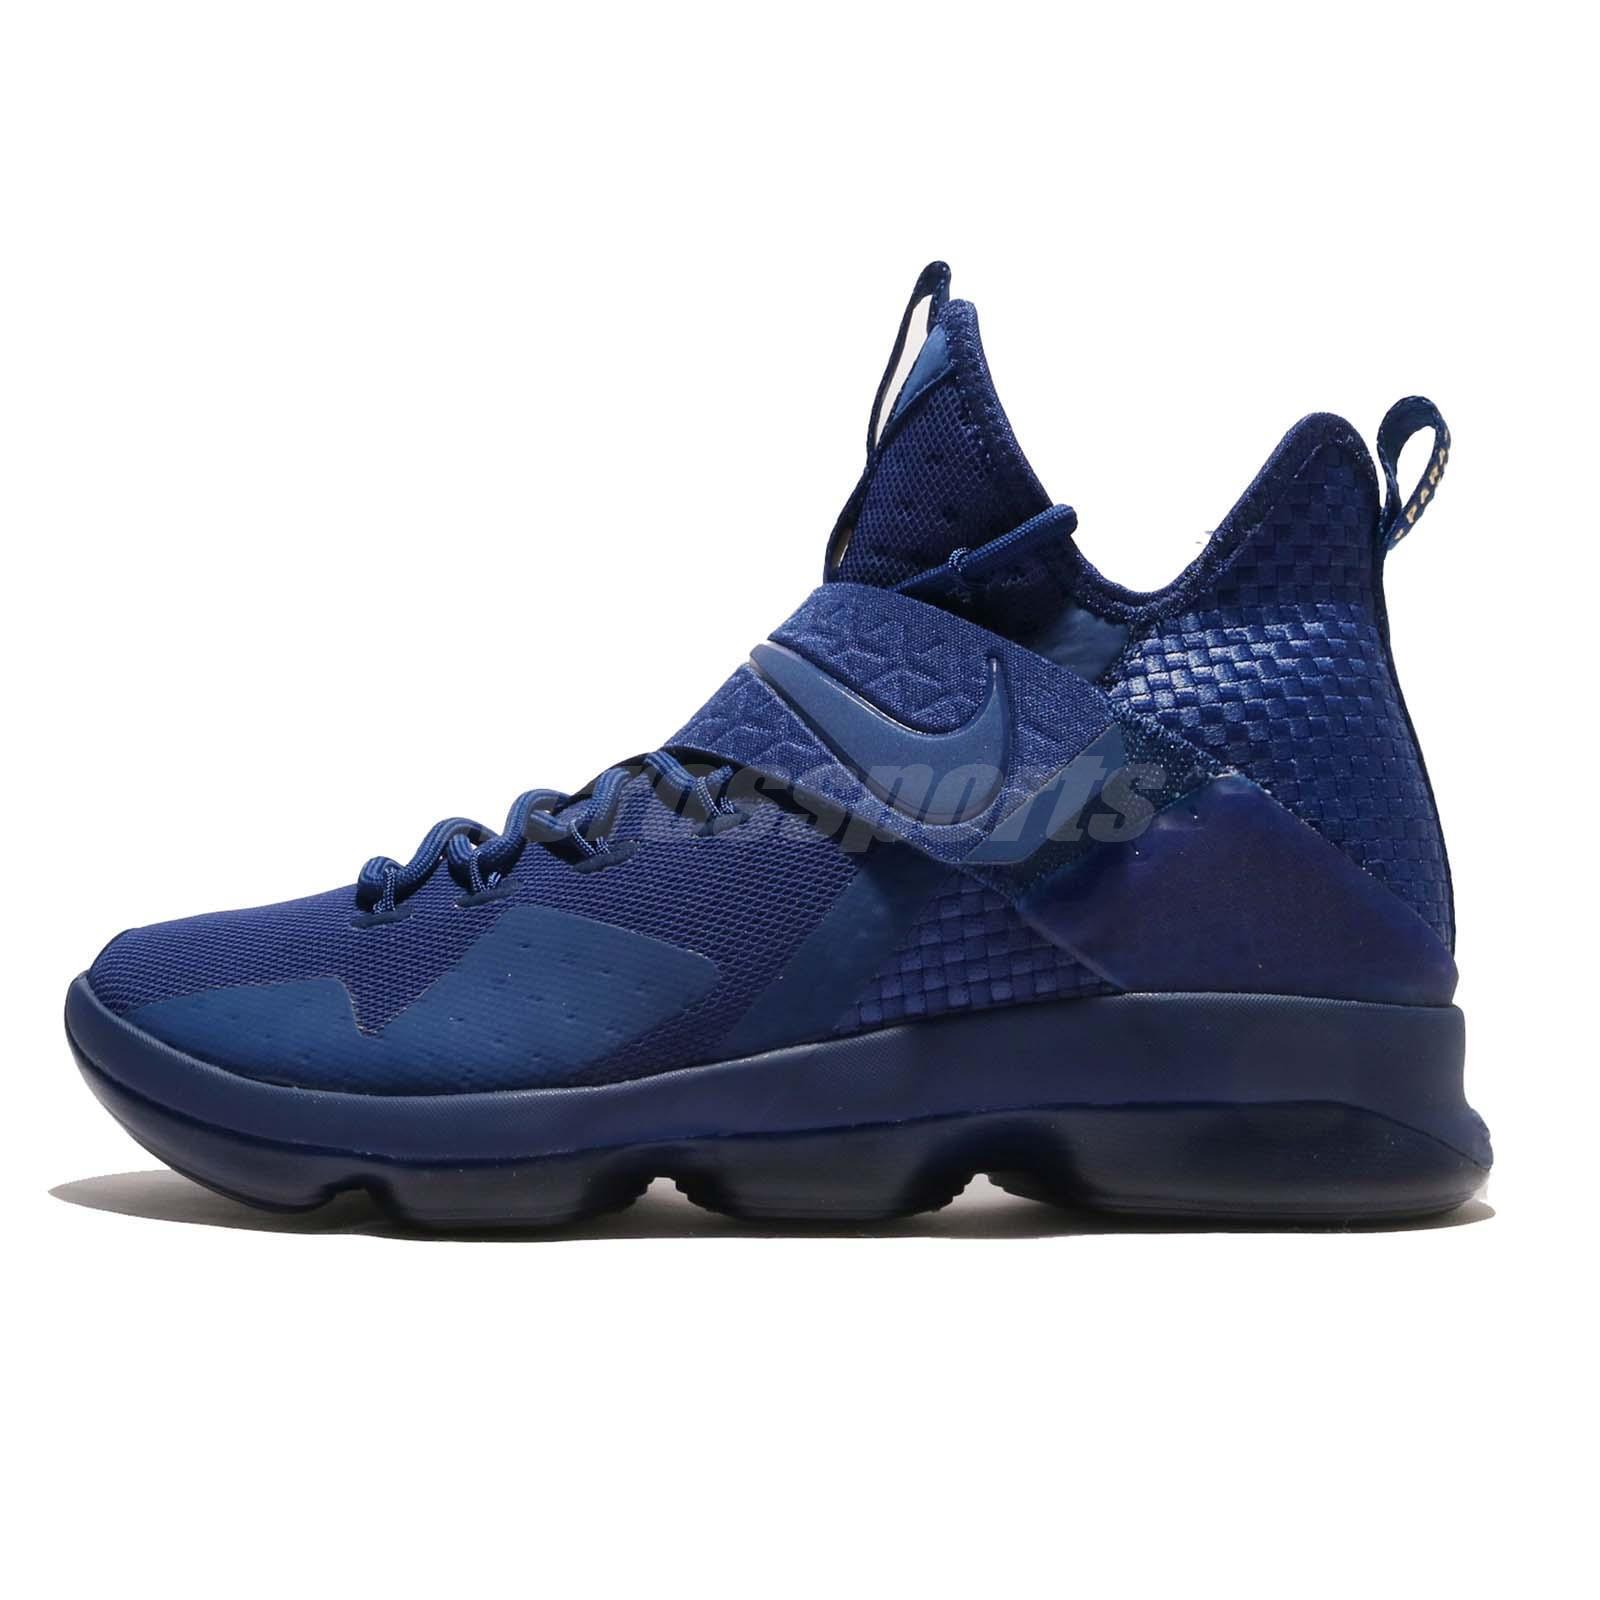 48f5b09ecae Nike Lebron XIV LMTD EP 14 James Agimat Philippines Coastal Blue on ...